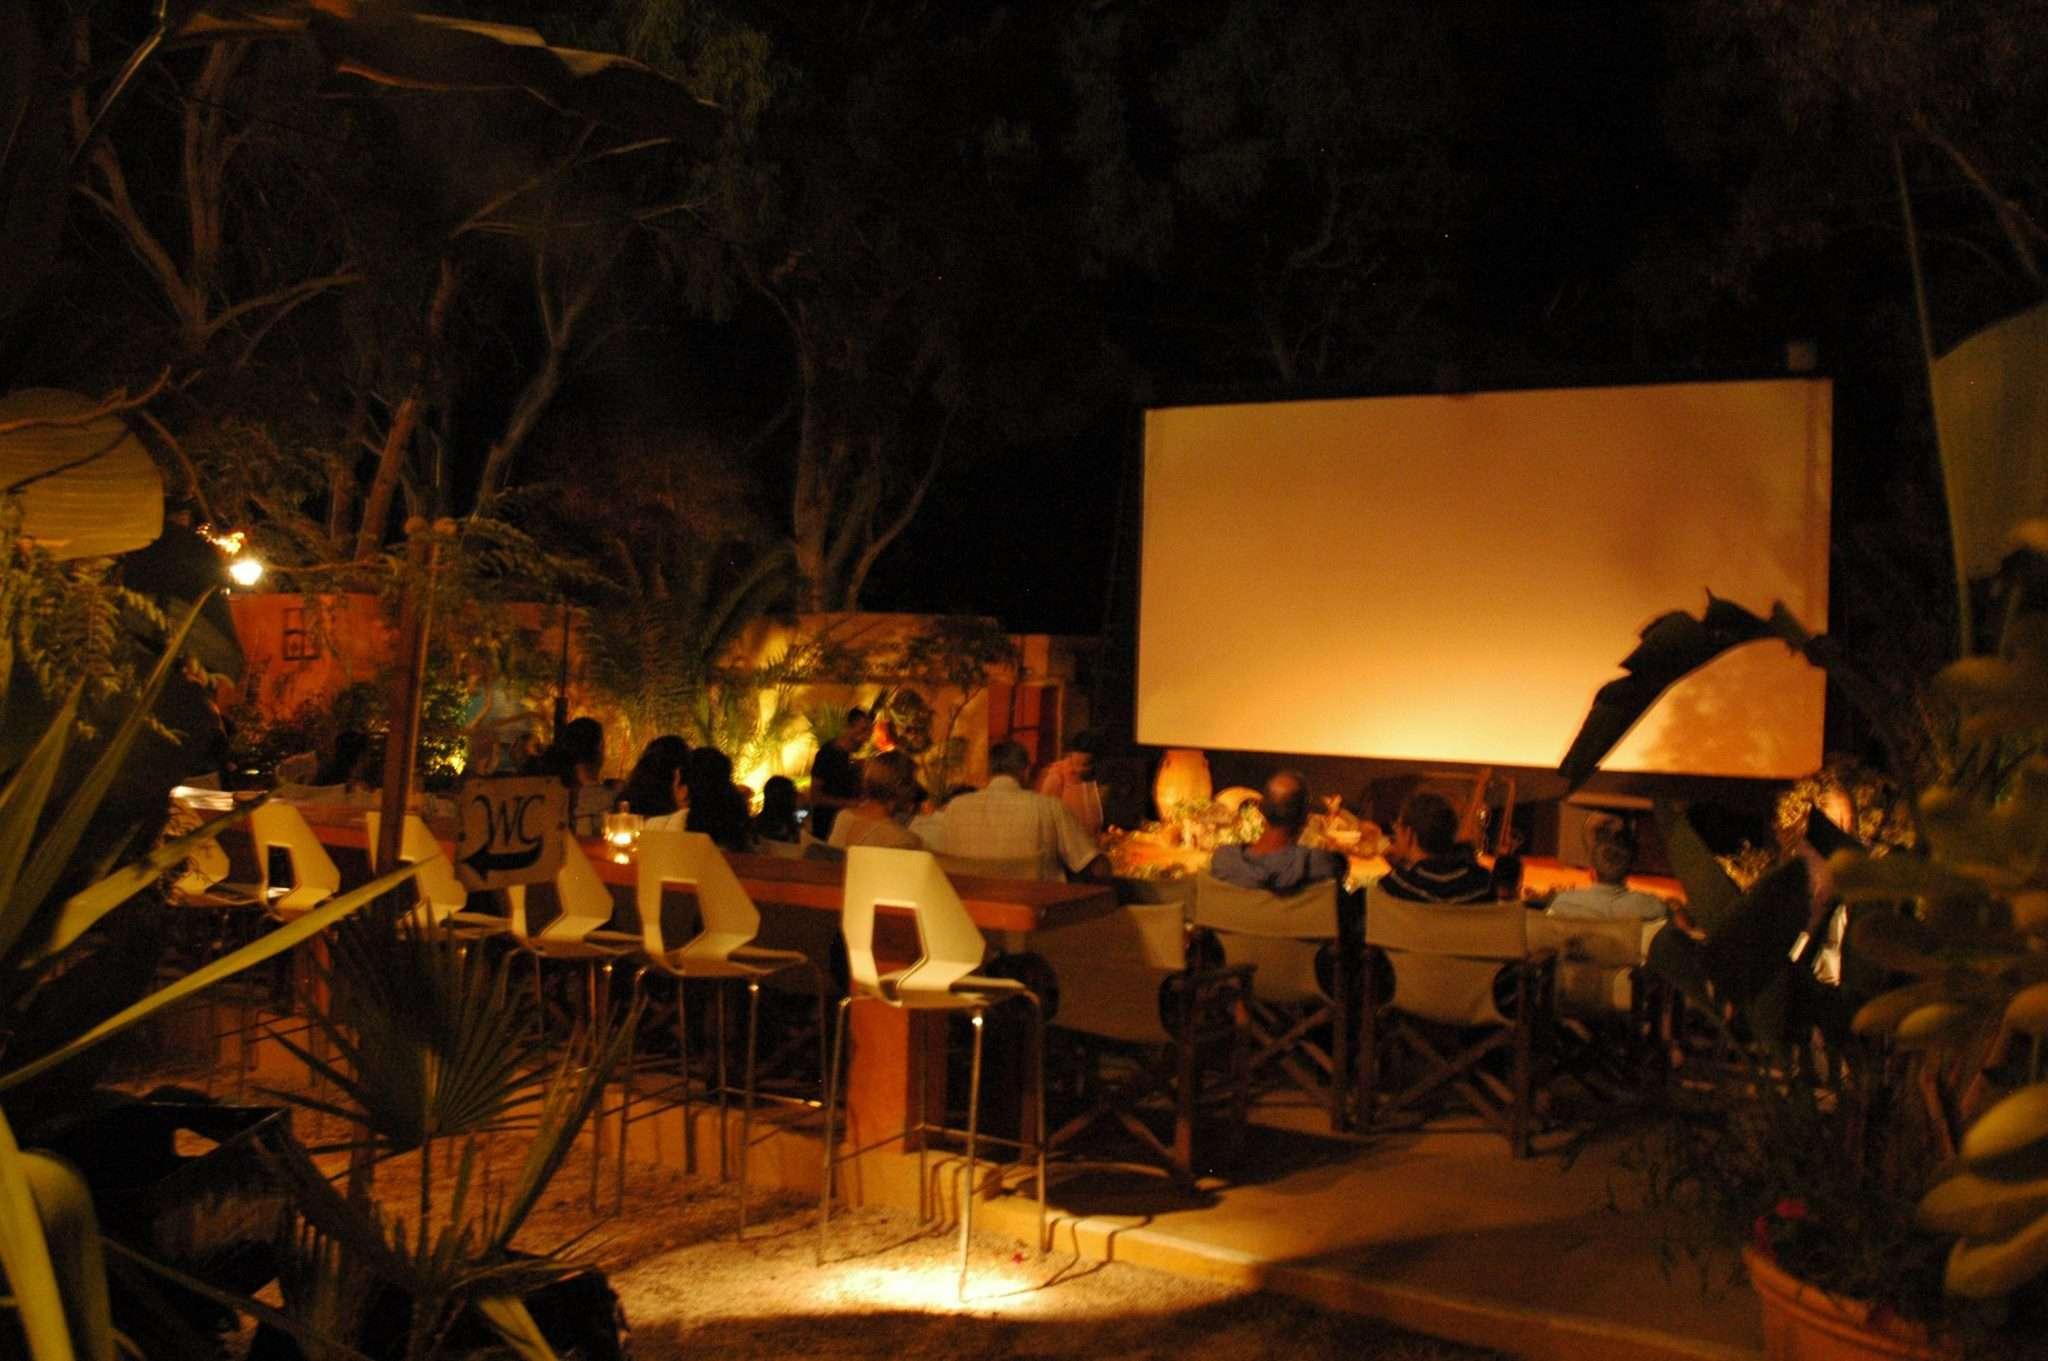 The movie screen at Open Air Cinema Kamari, Santorini